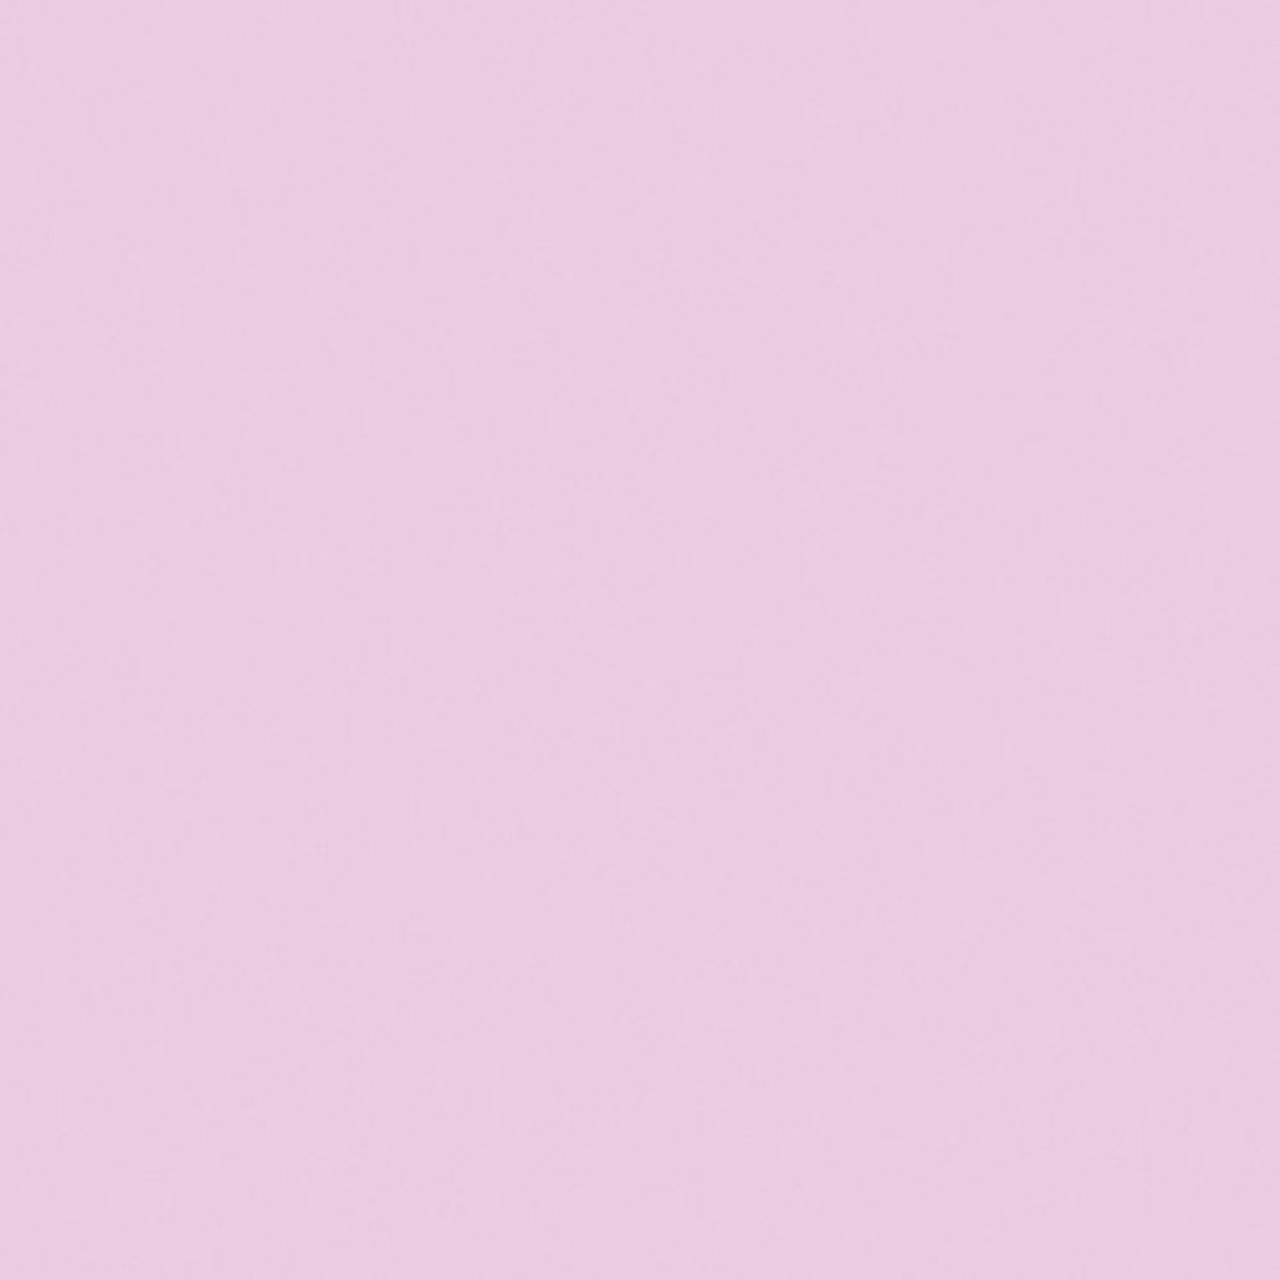 "#0333 Rosco Gels Roscolux Blush Pink, 20x24"""